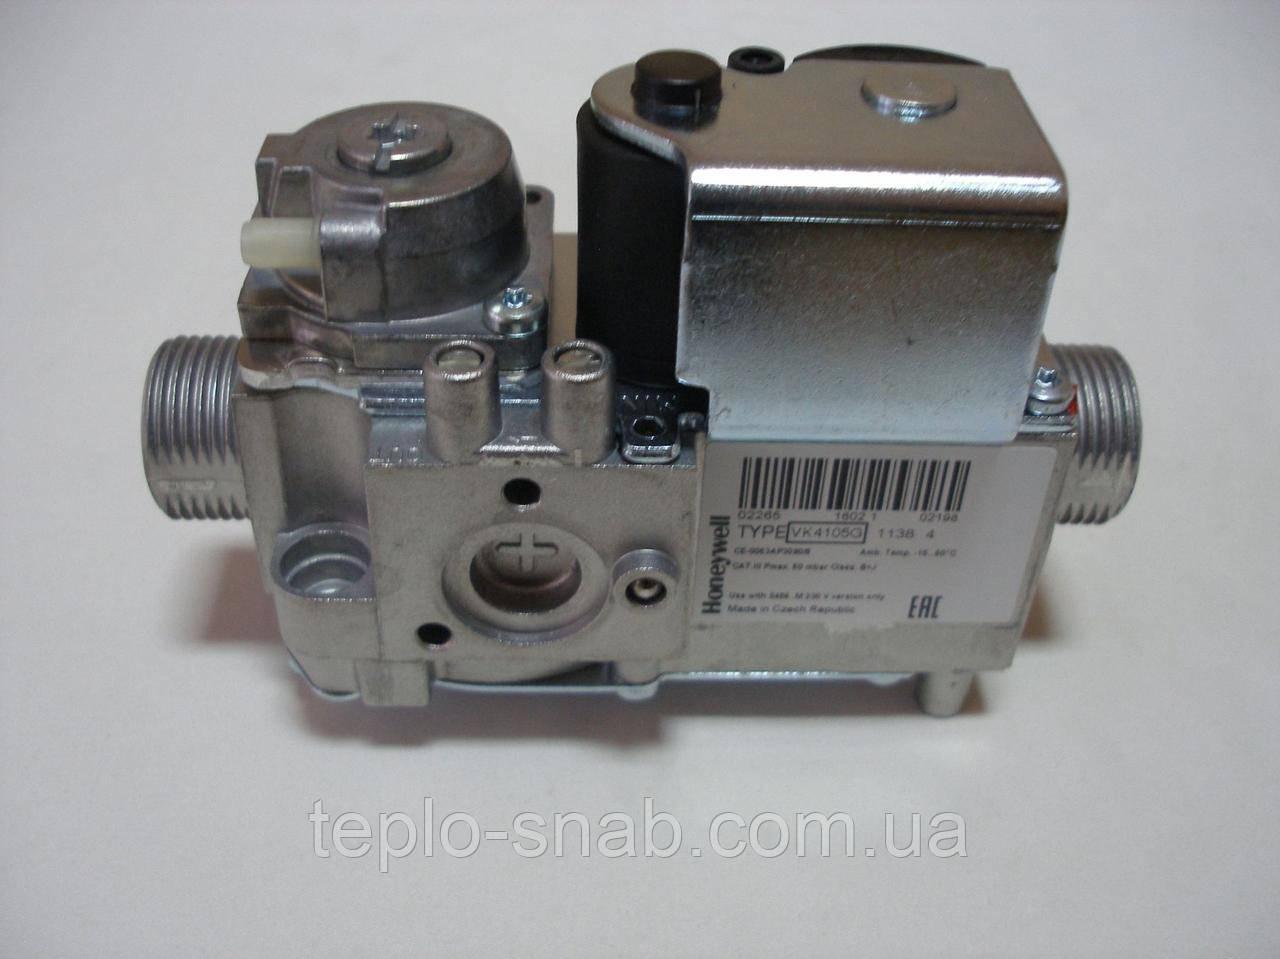 Газовый клапан Honeywell 4105 G. Baxi MAIN 18F, Westen Quasar D24. 5702340